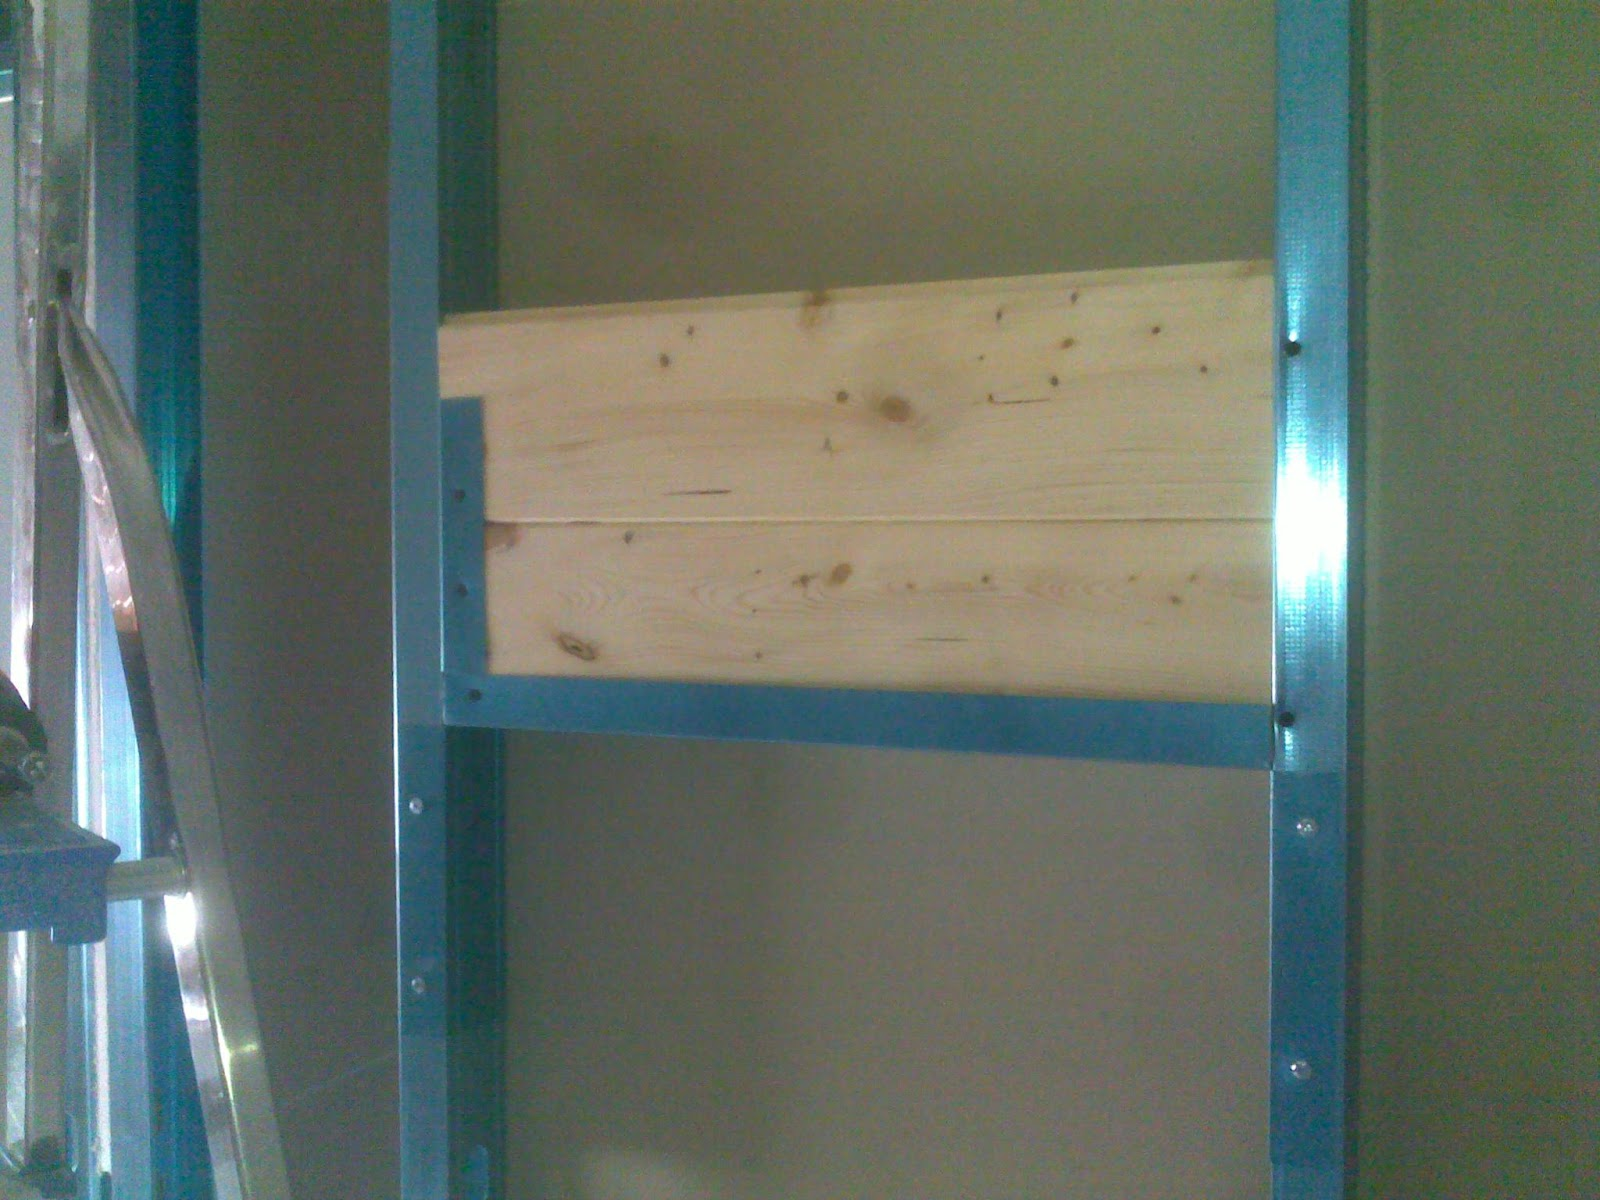 Rinforzi cartongesso – Terminali antivento per stufe a pellet